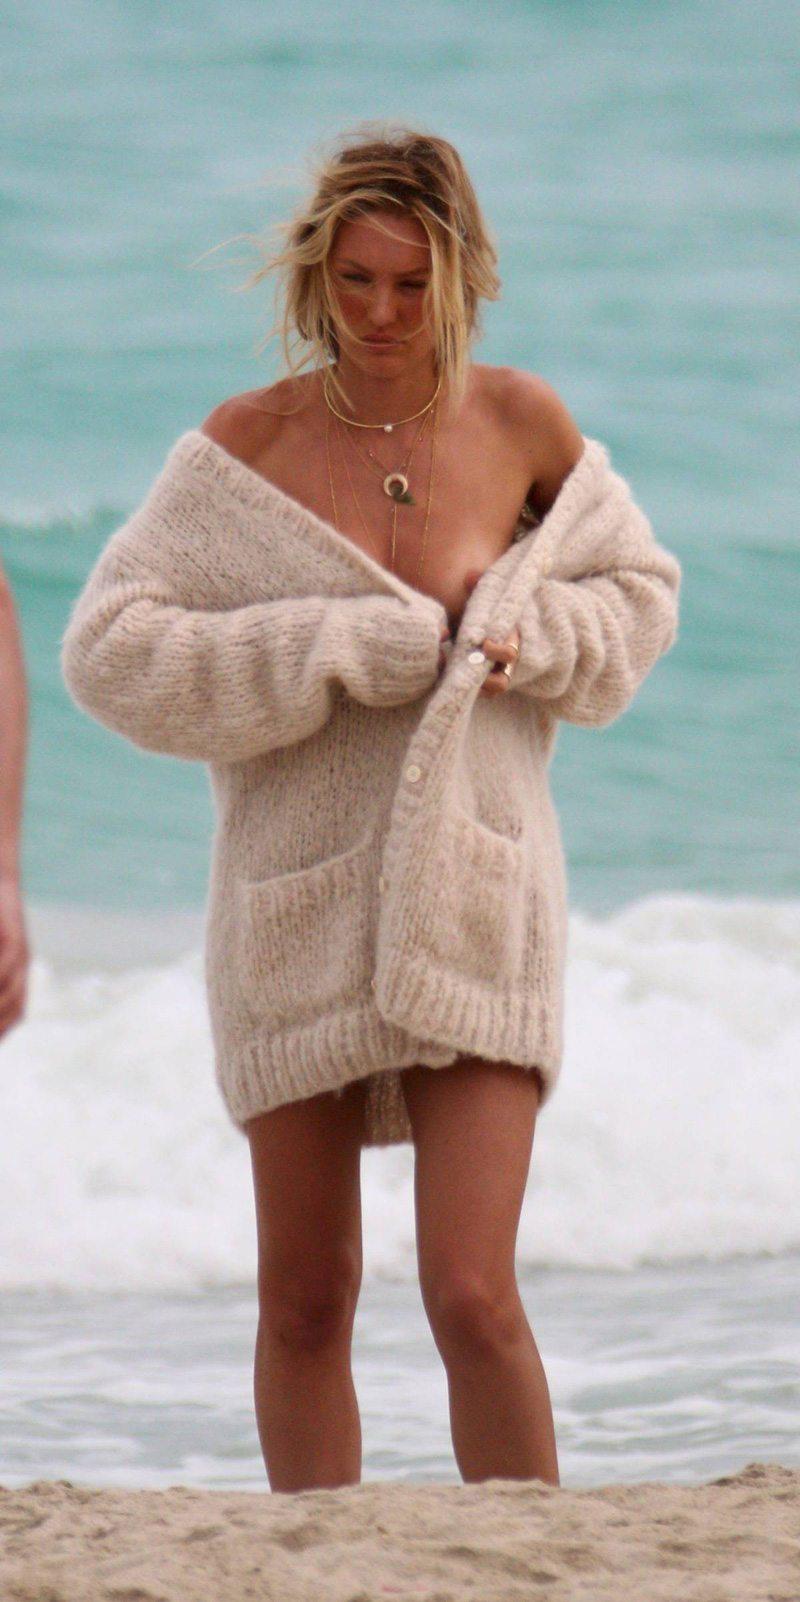 Candice Swanepoel nip slip | Celebrity Oops – The best celeb ...